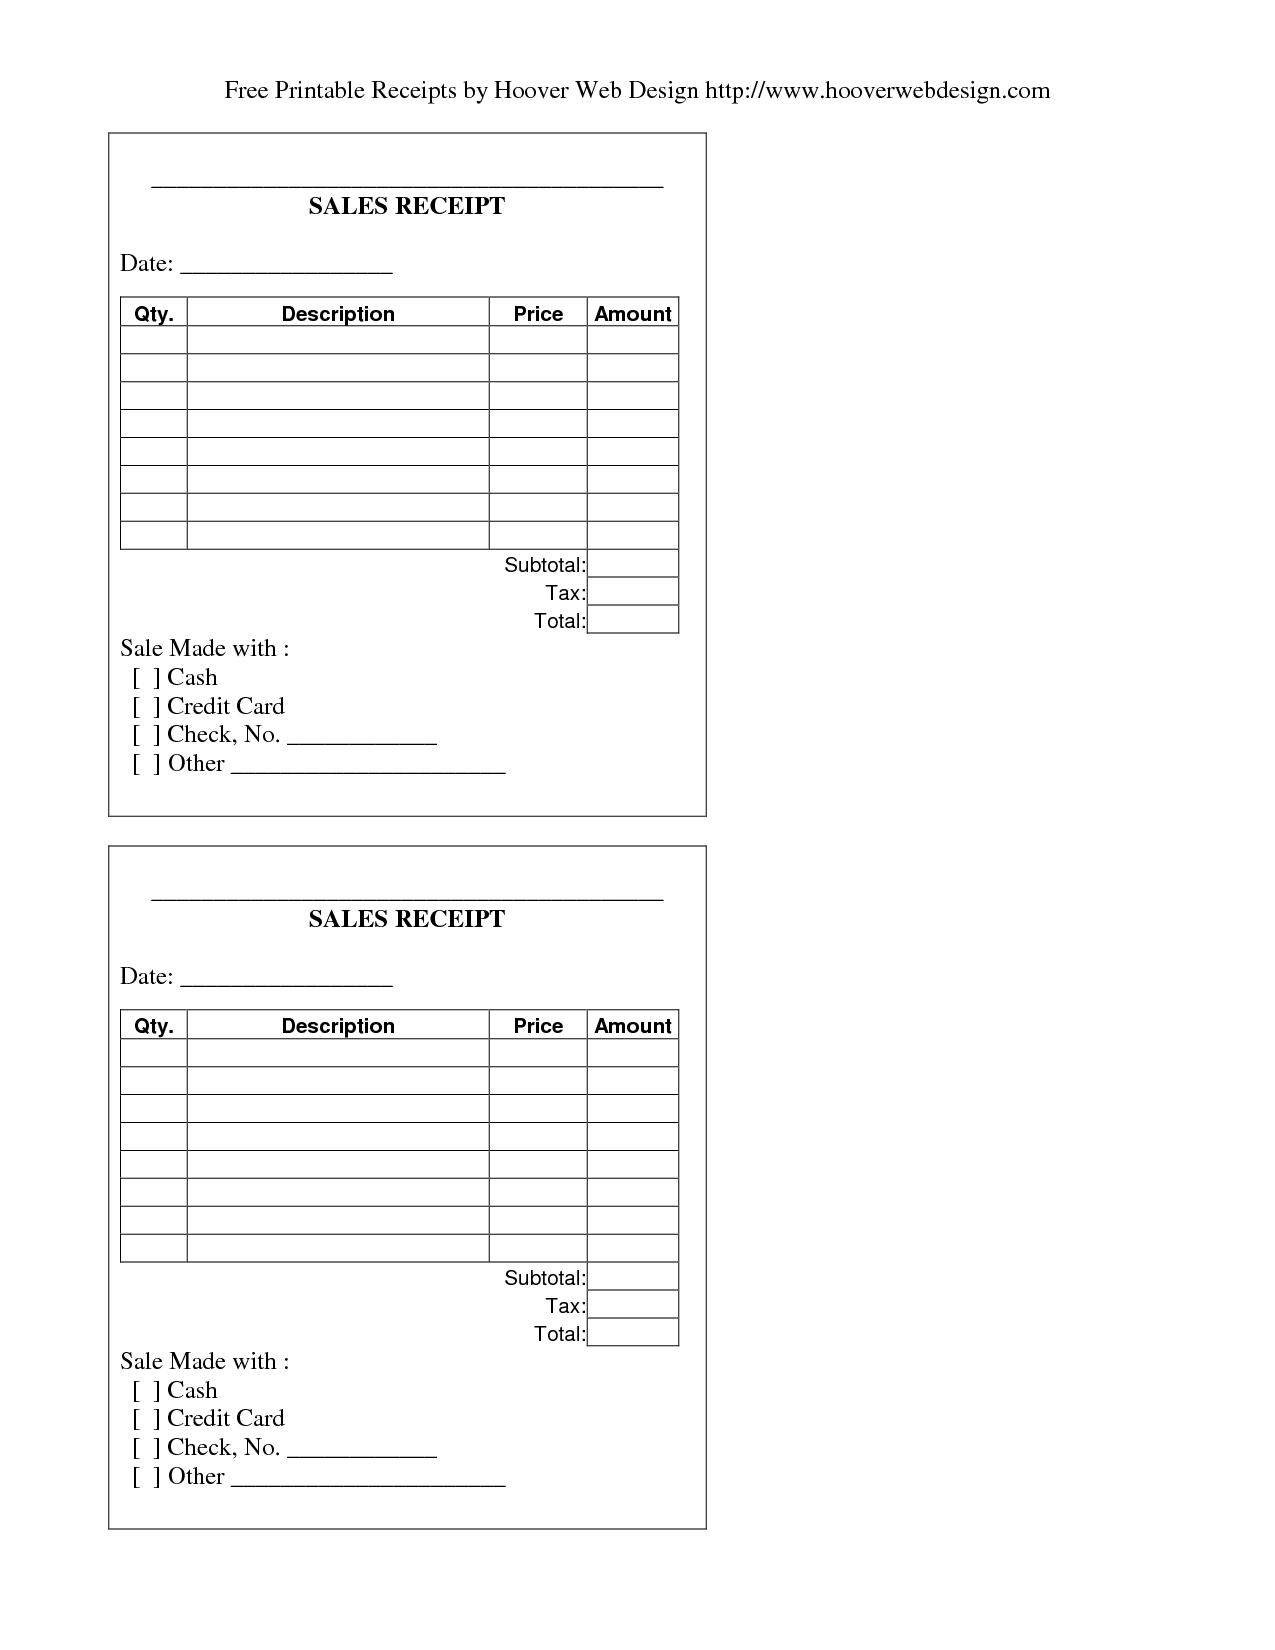 Doc709449 Printable Blank Receipt Free Receipt Forms 72 – Blank Receipt to Print